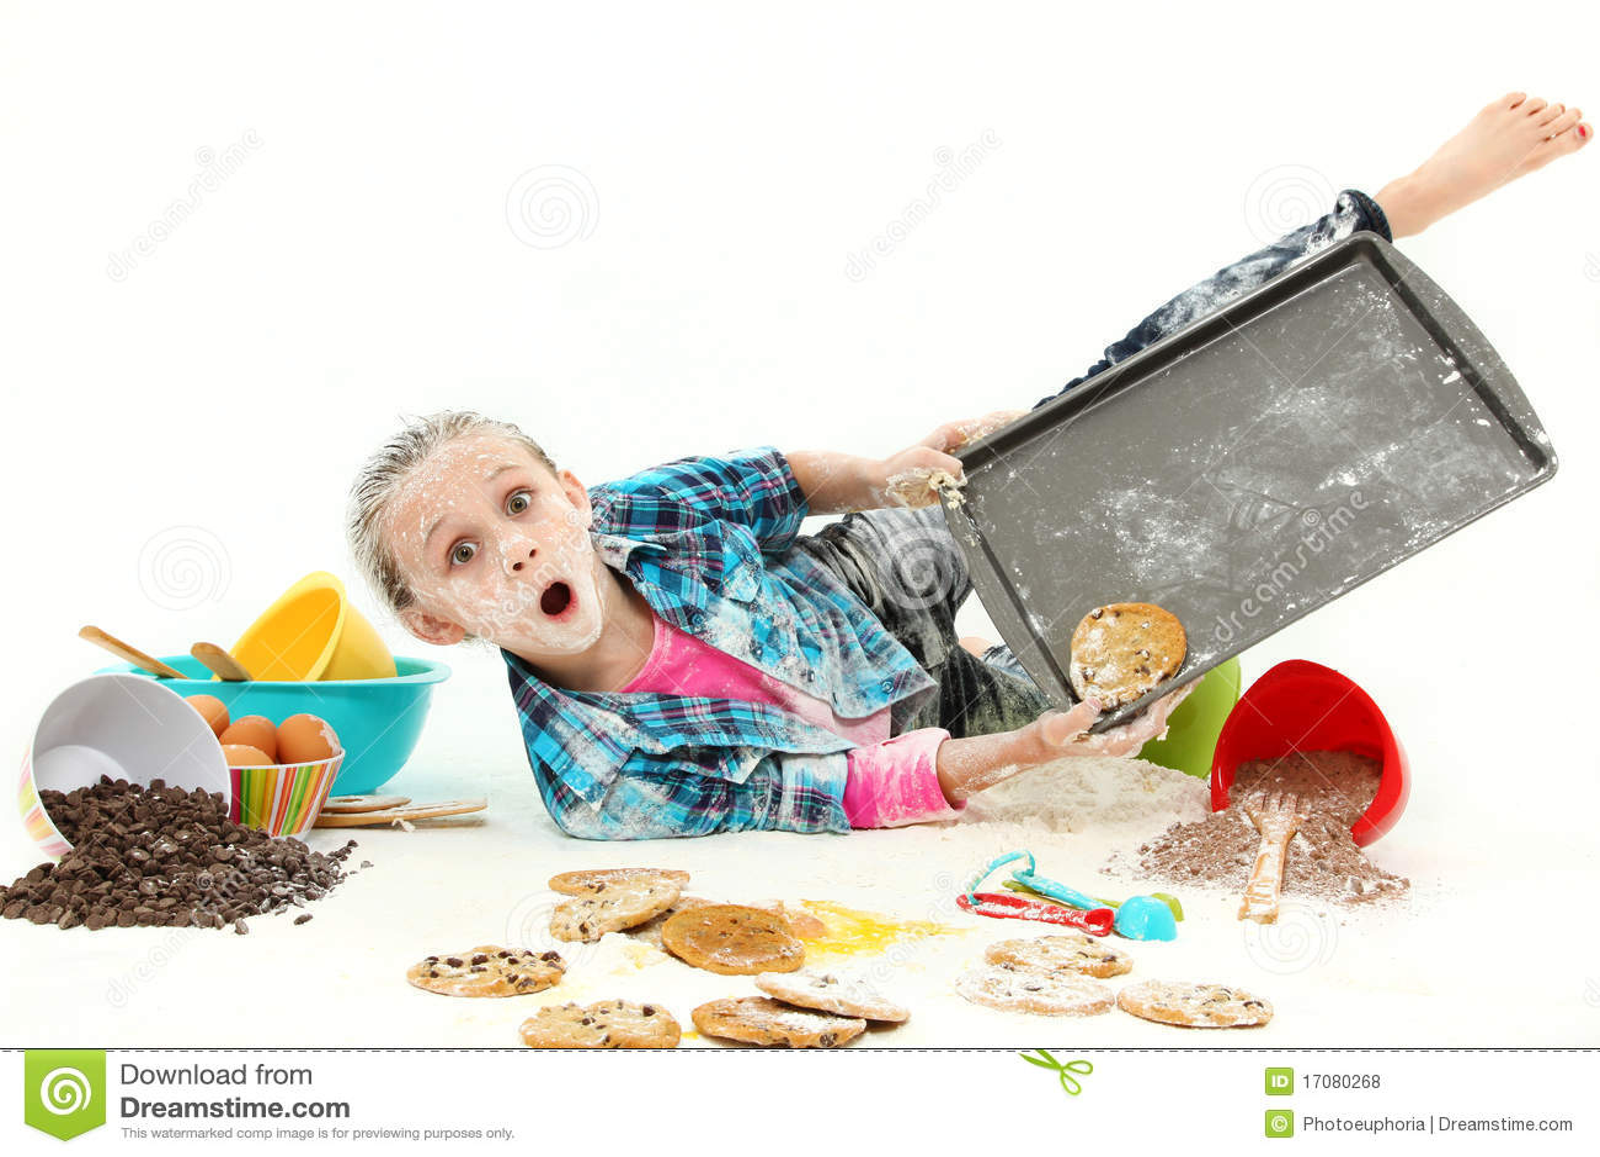 Child Baking Cookies Mess Royalty Free Stock Photos